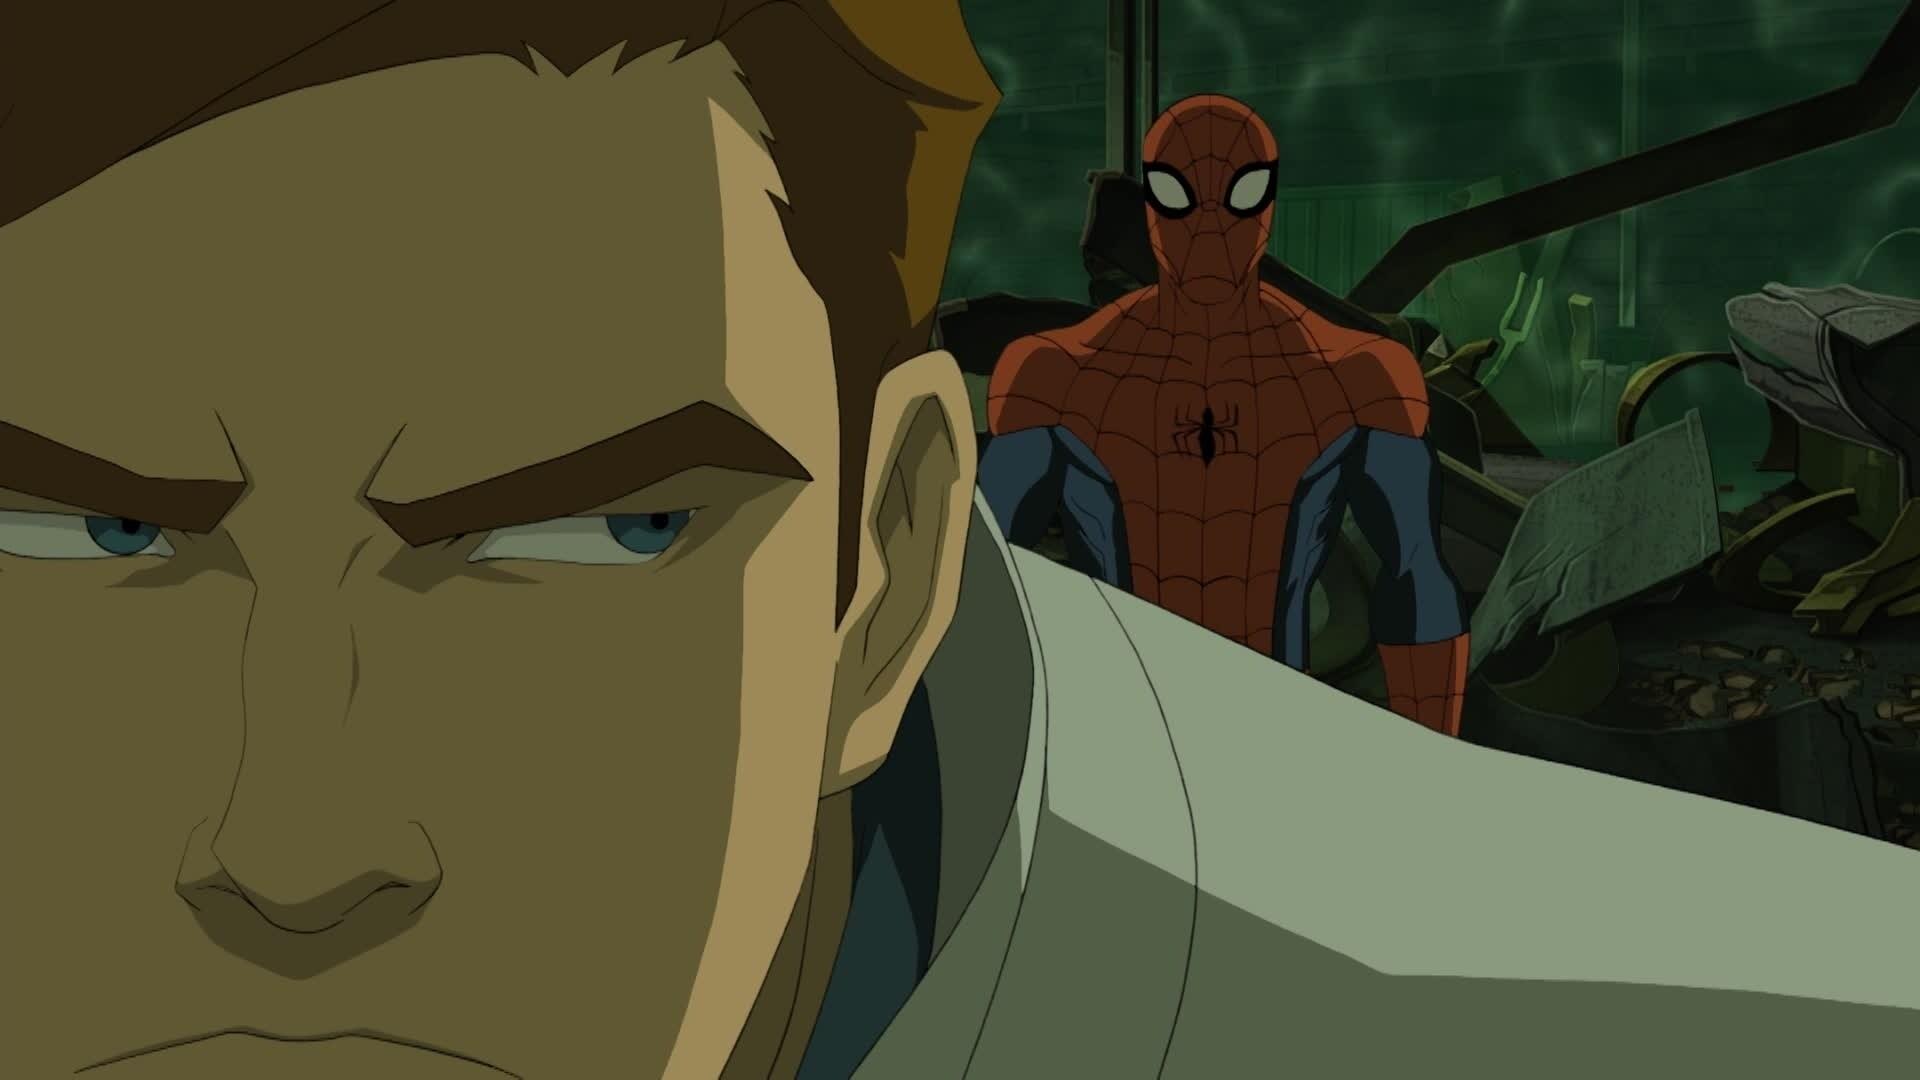 Ultimate Spider-Man - Van dokter naar hagedis